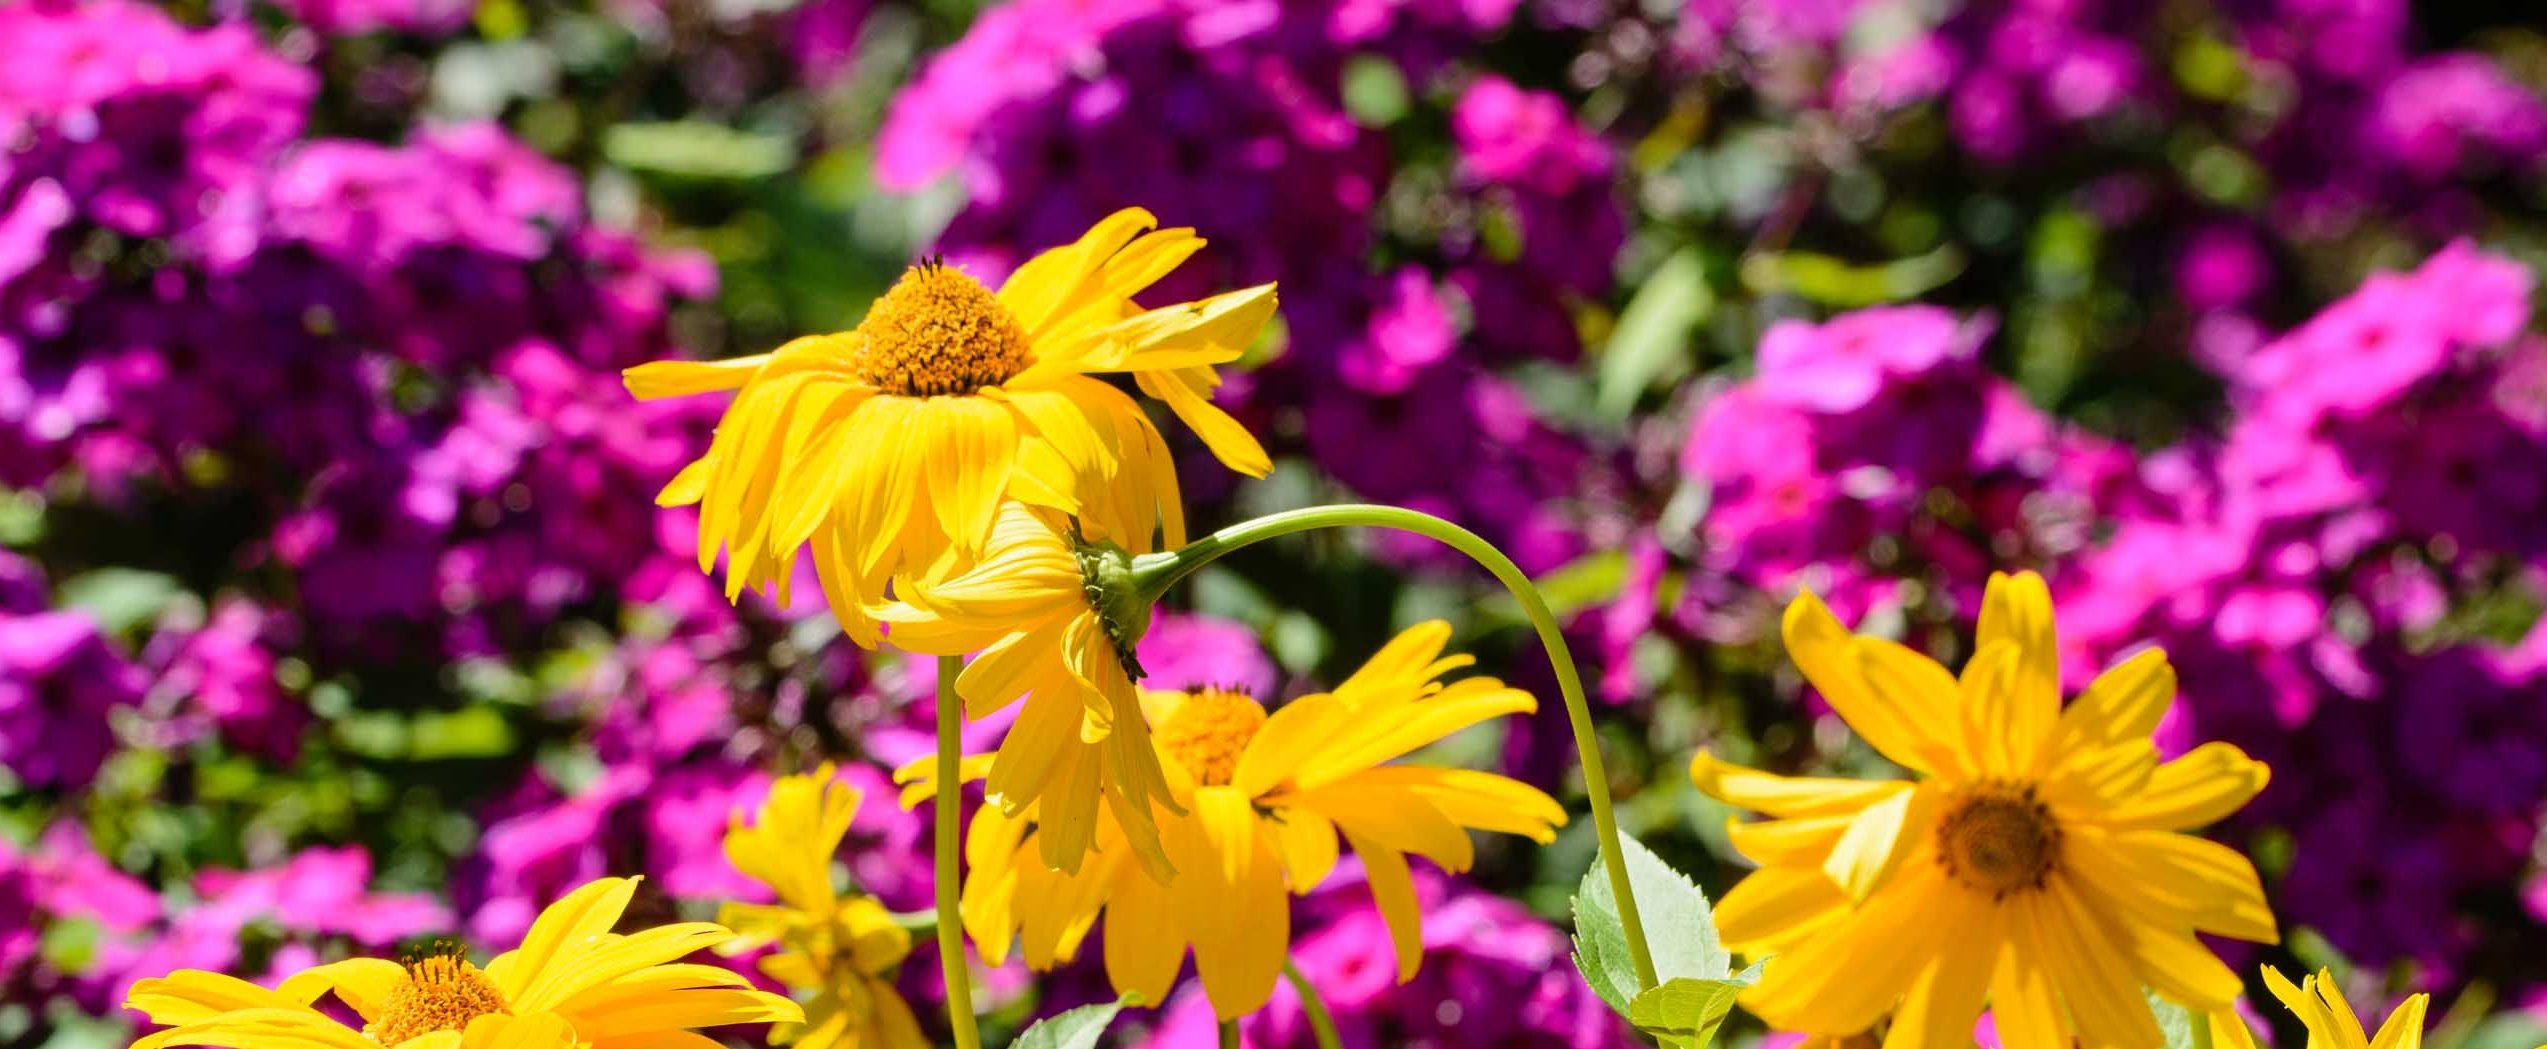 Arboretum Ellerhoop, Farben- und Blütenpracht!